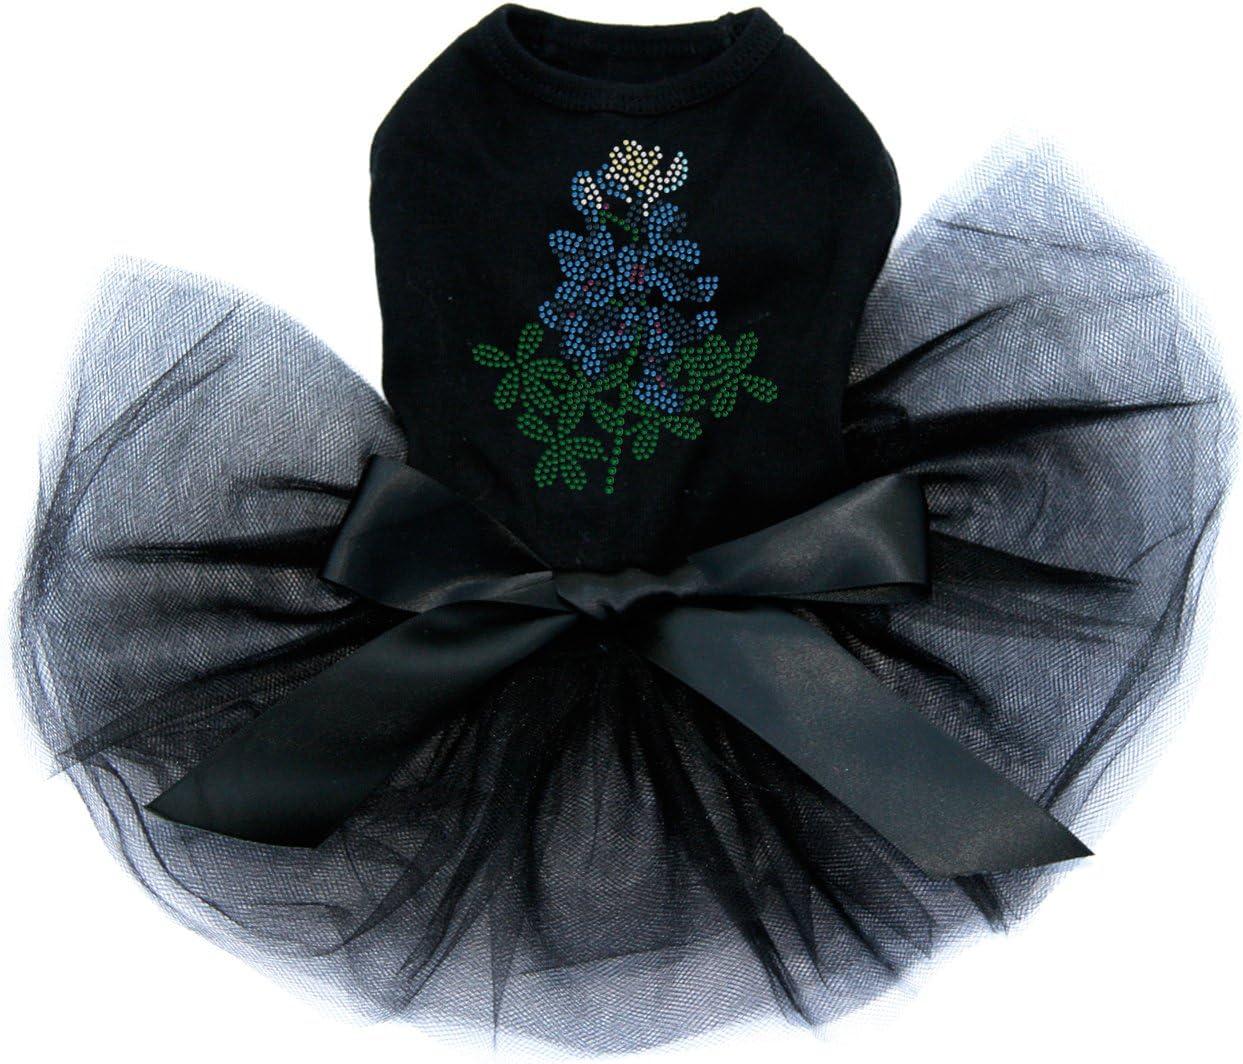 Bluebonnet specialty shop At the price - Bling Rhinestone Dog Tutu Dress Black 4XL